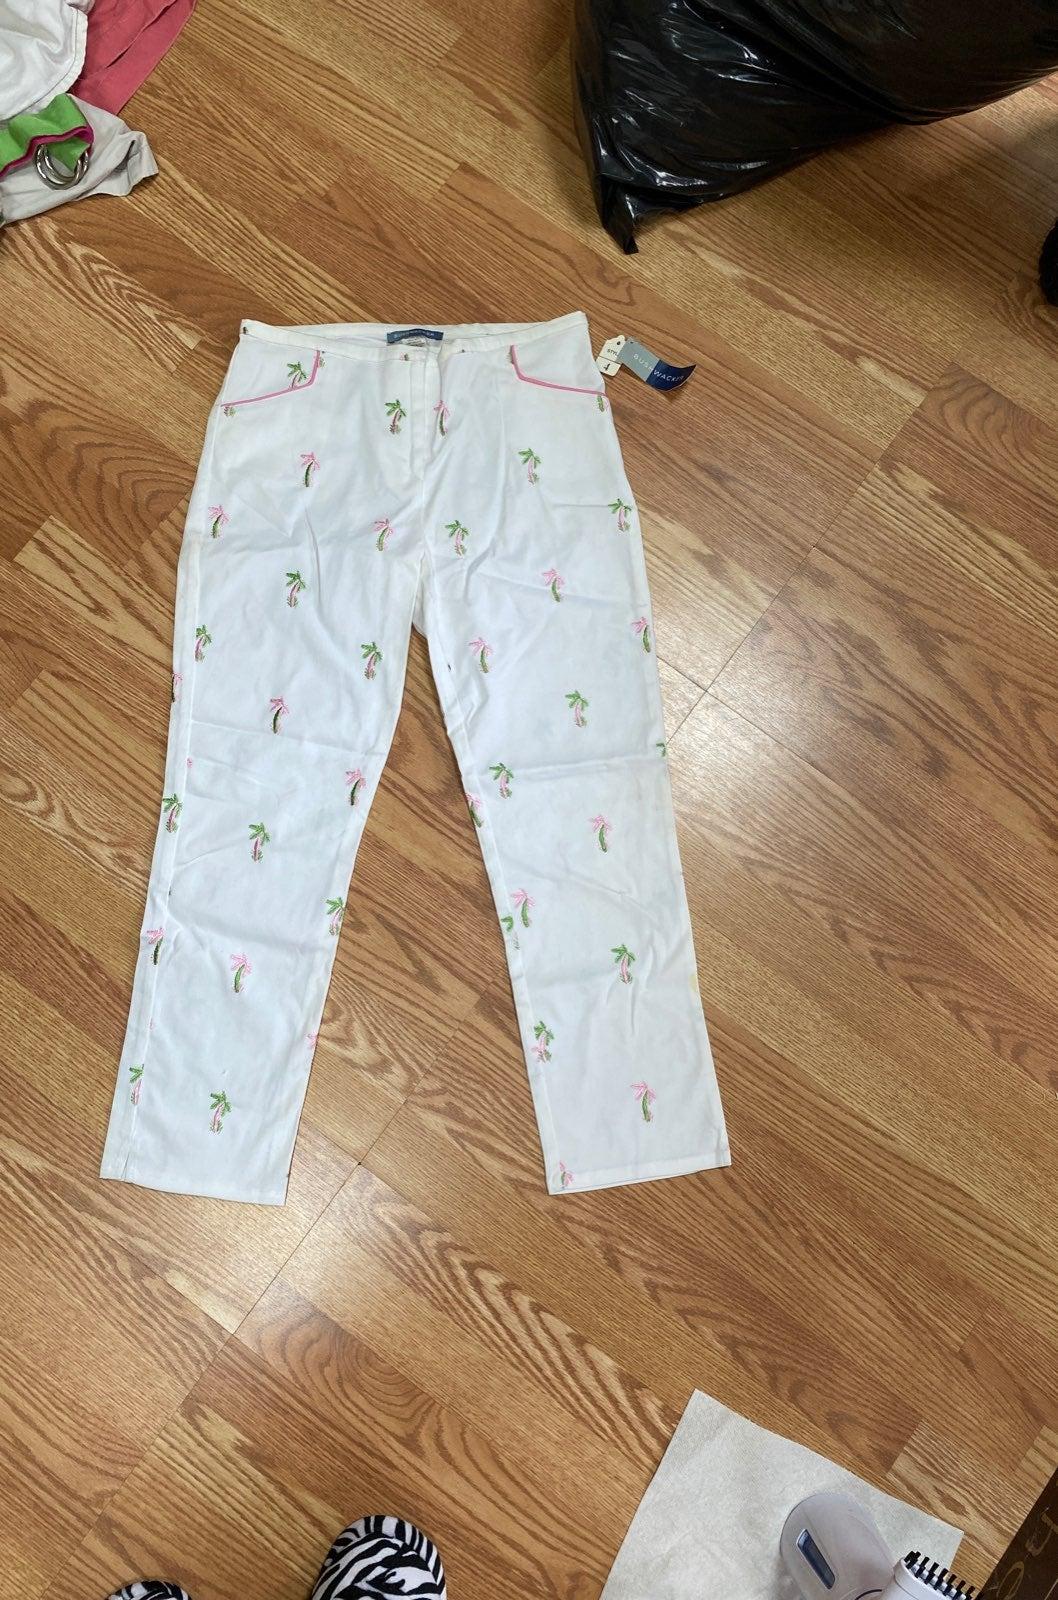 Bushwacker Capri pants